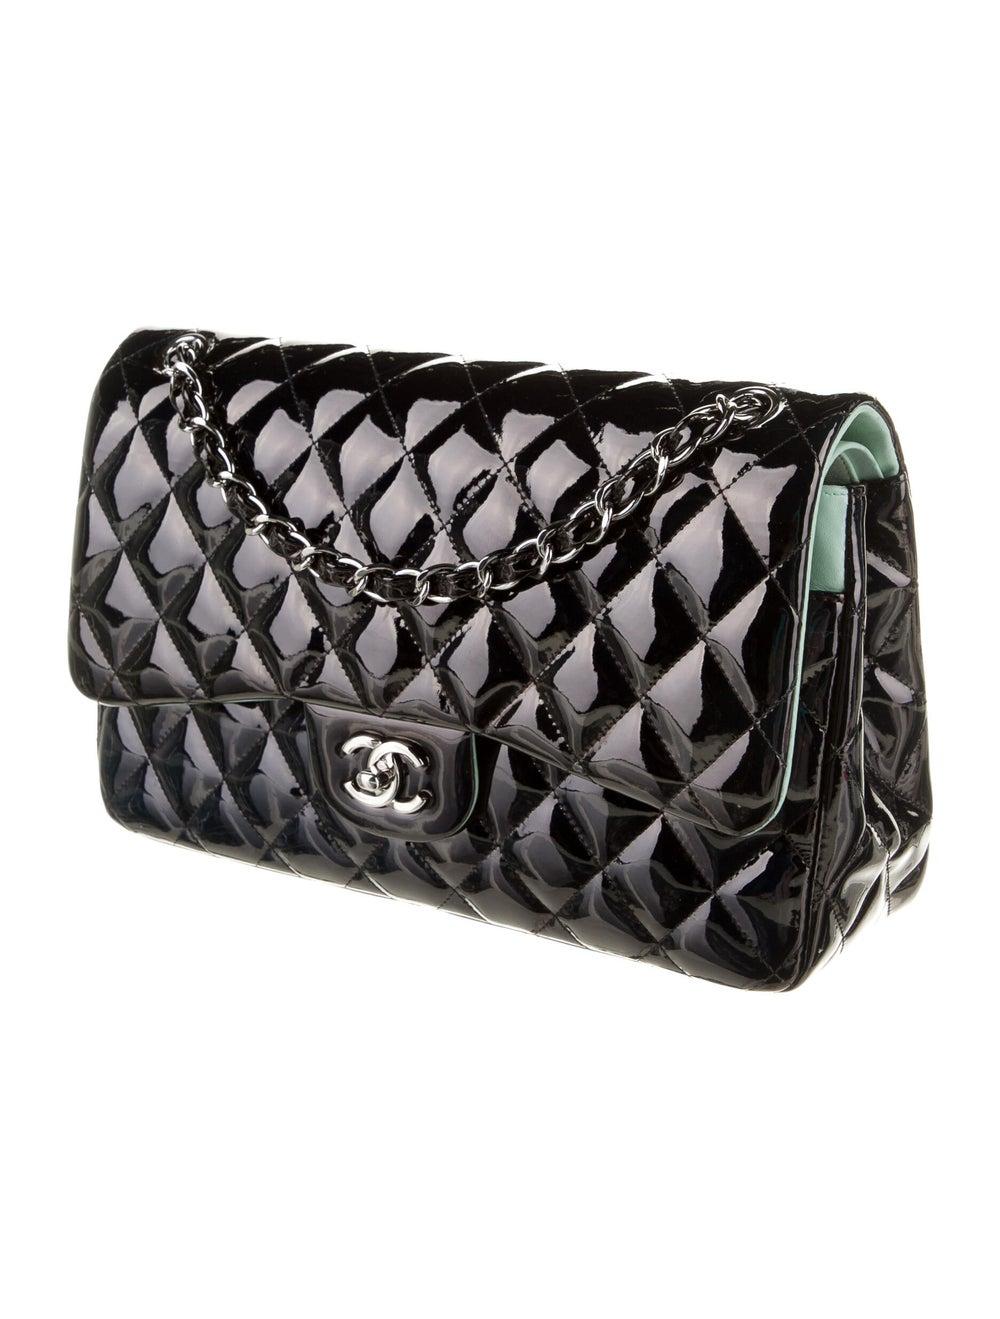 Chanel Classic Jumbo Patent Double Flap Bag Blue - image 3